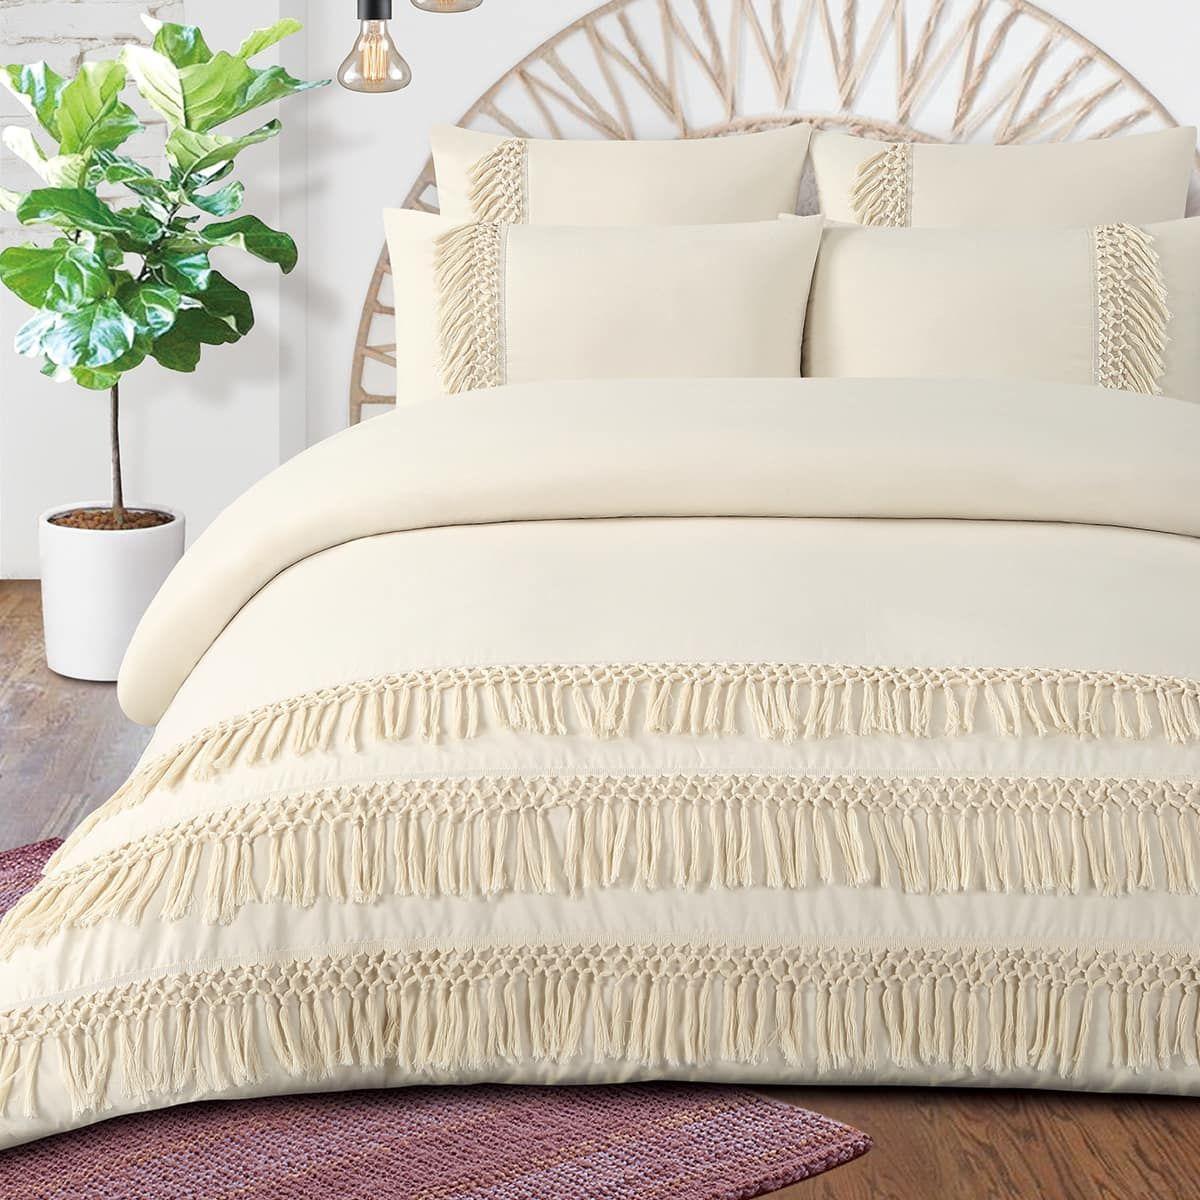 Boho Fringe Organic Cotton Percale Duvet Cover Set